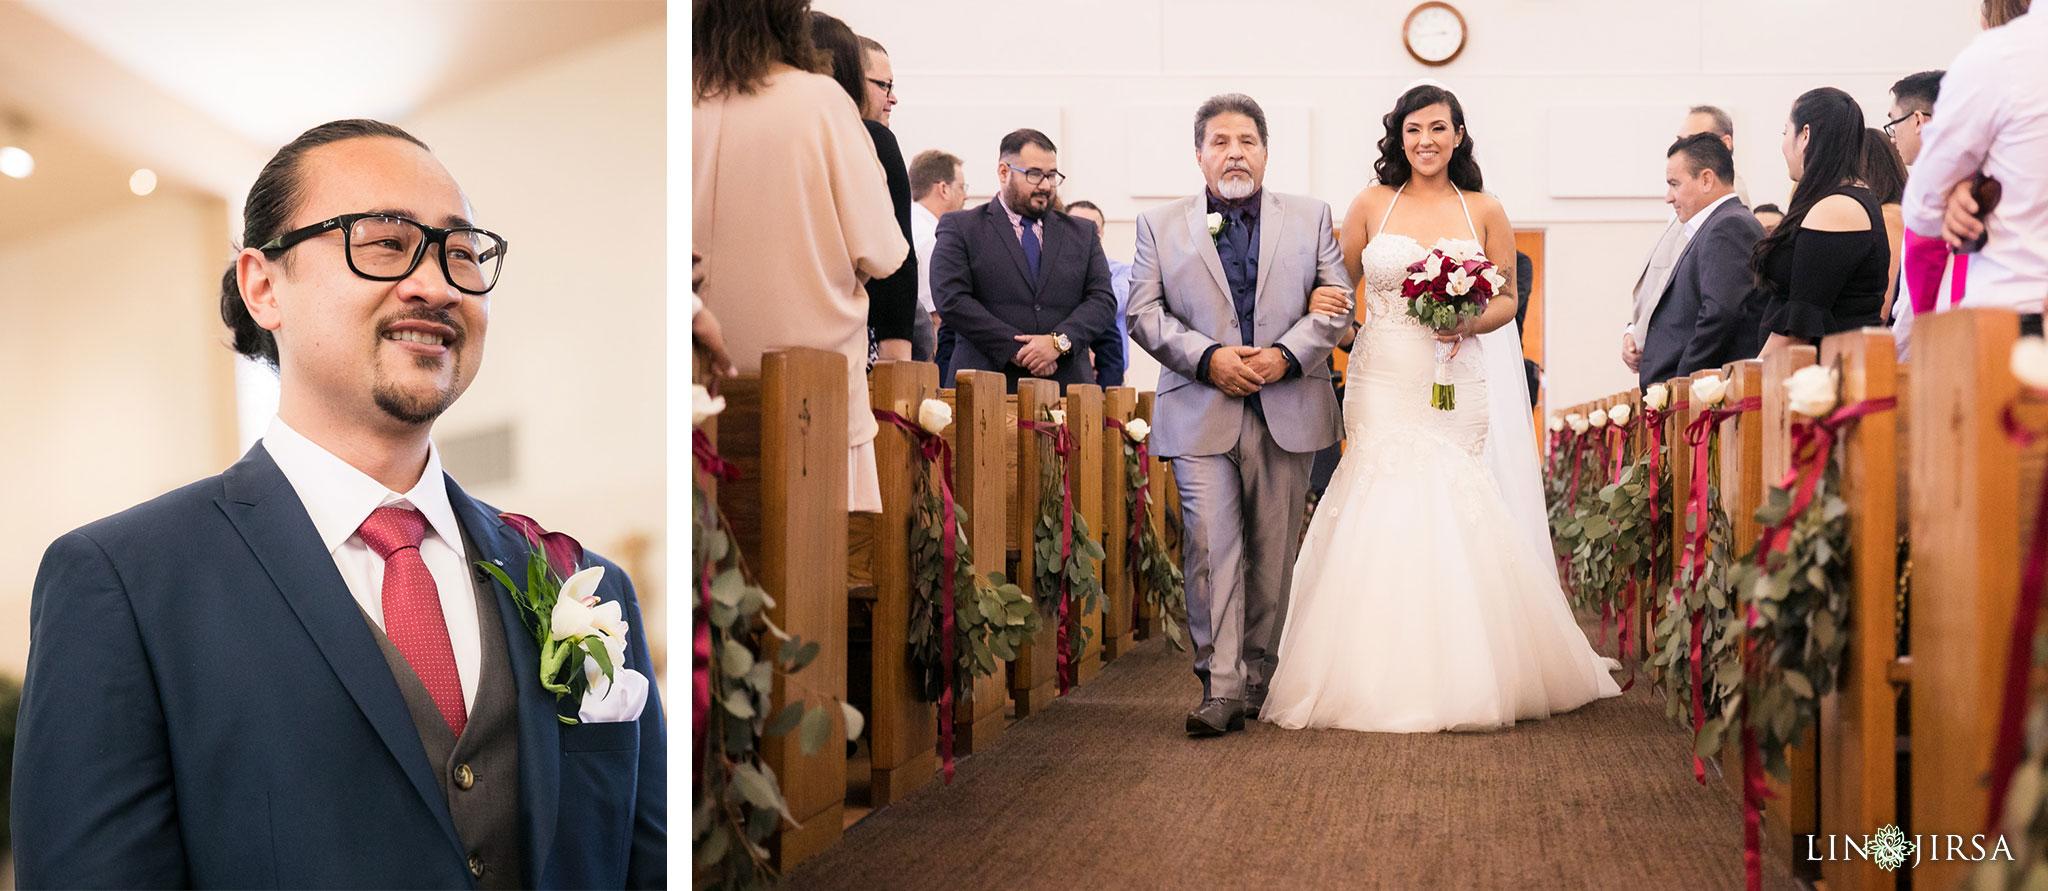 12 st anthony claret church orange county wedding ceremony photography